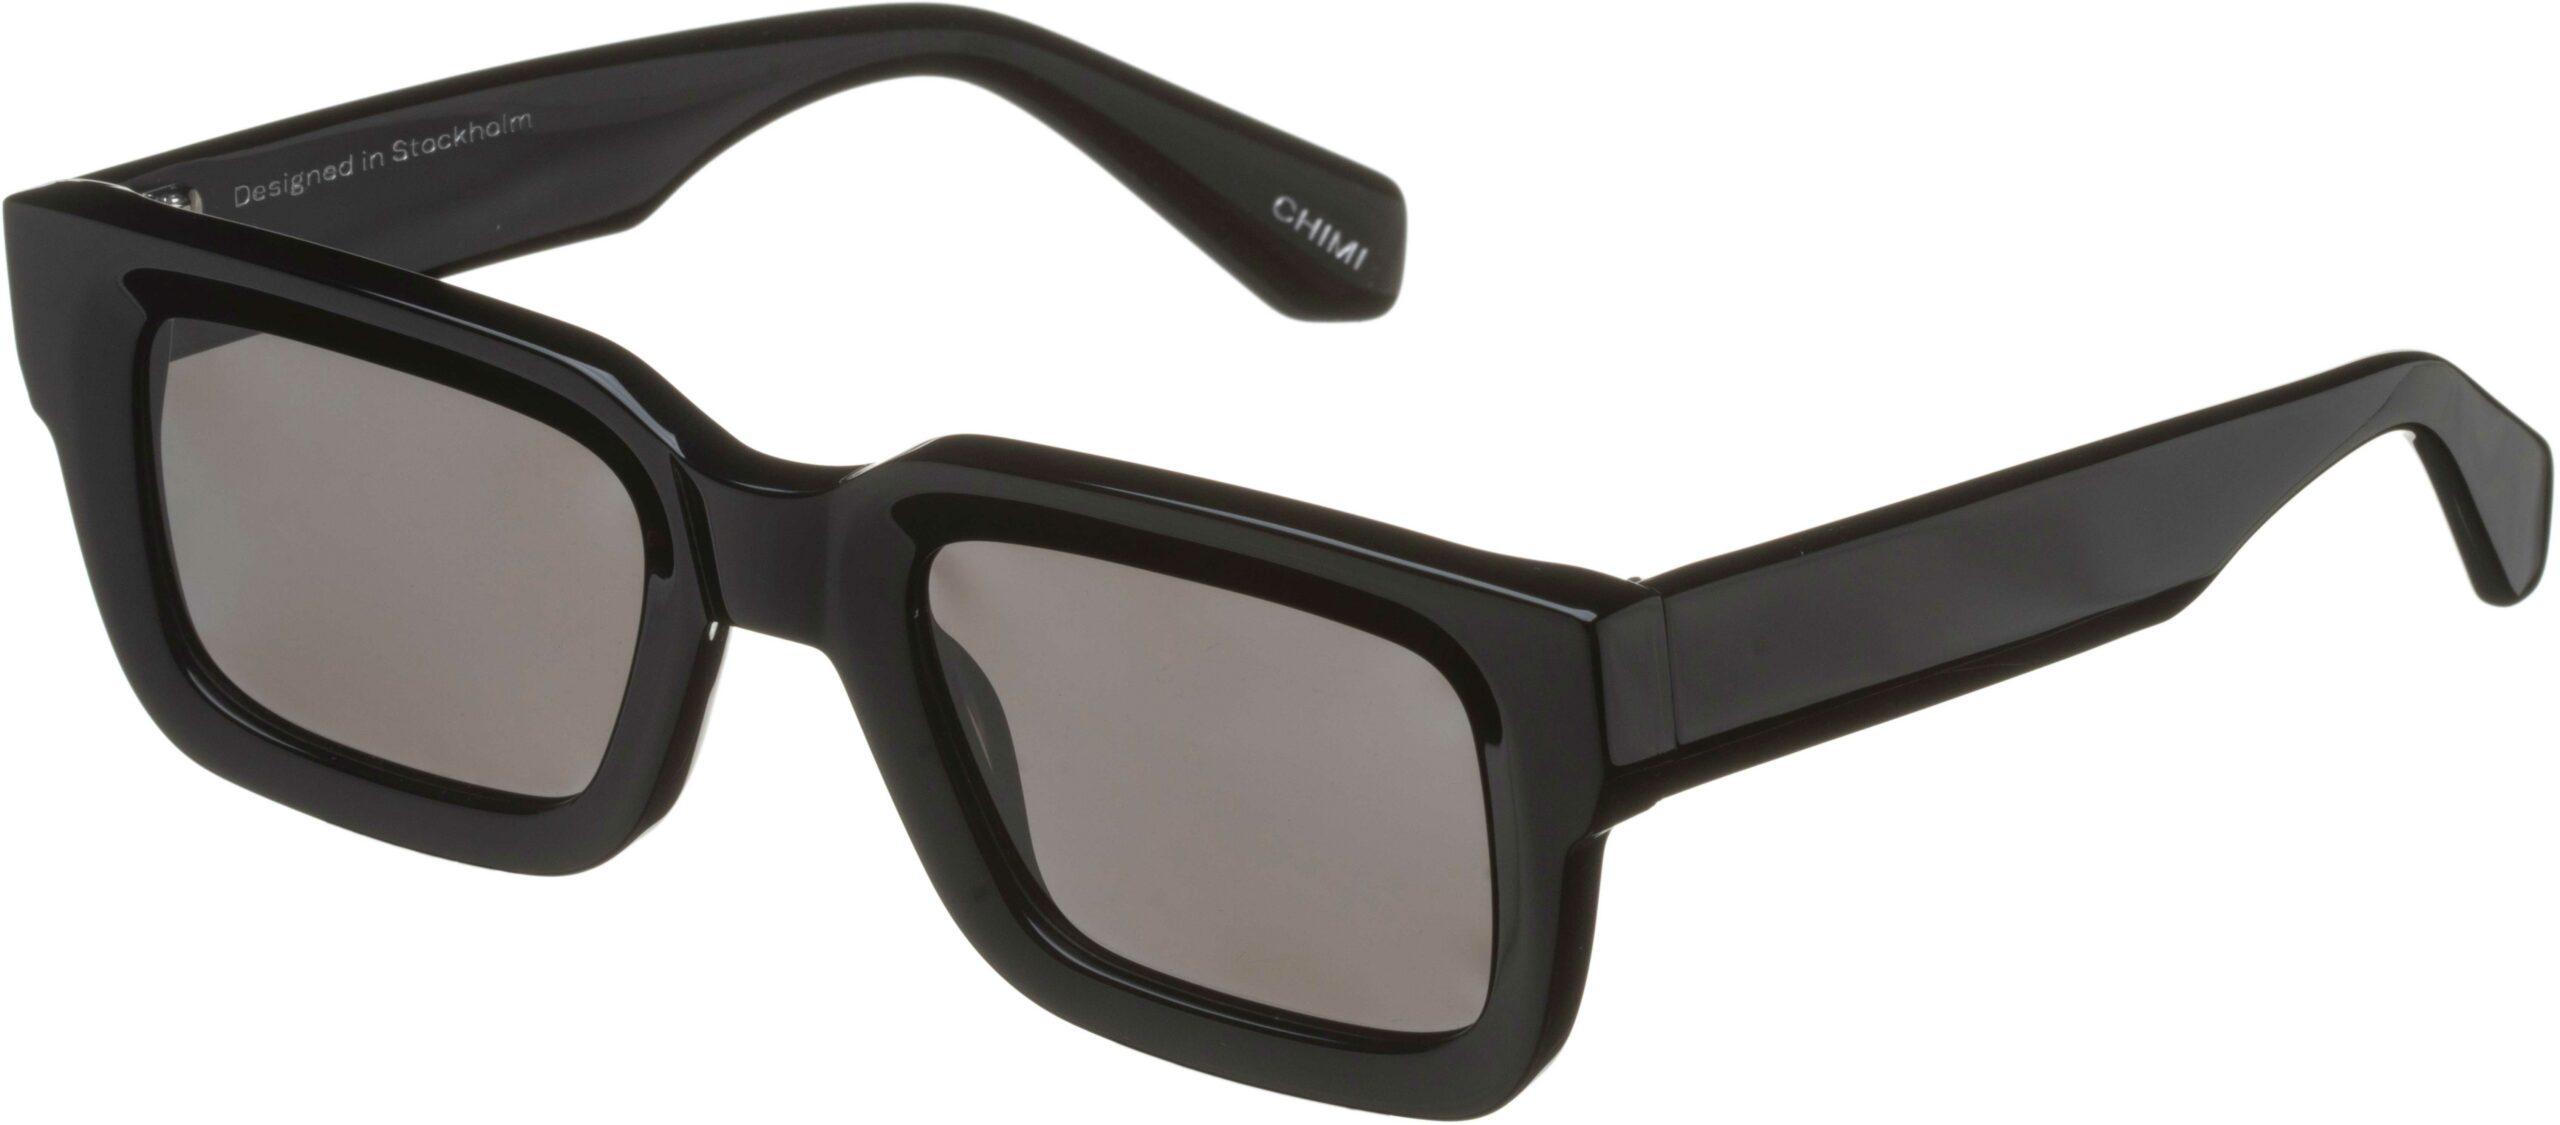 Chimi Eyewear #05 Black/Black Gradient | 7340192603966